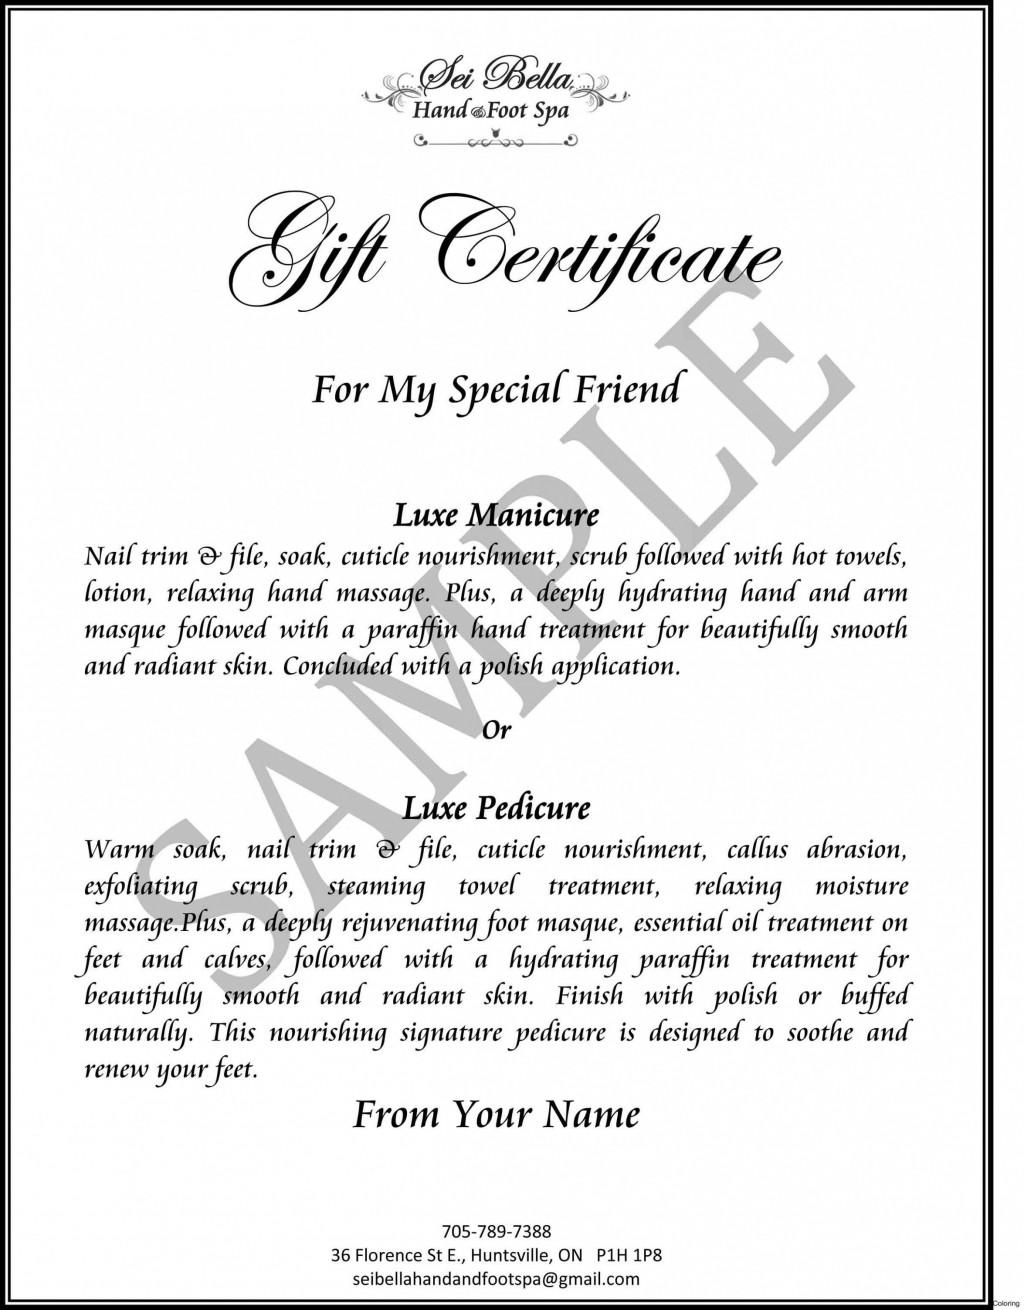 007 Formidable Silent Auction Donation Certificate Template Concept Large